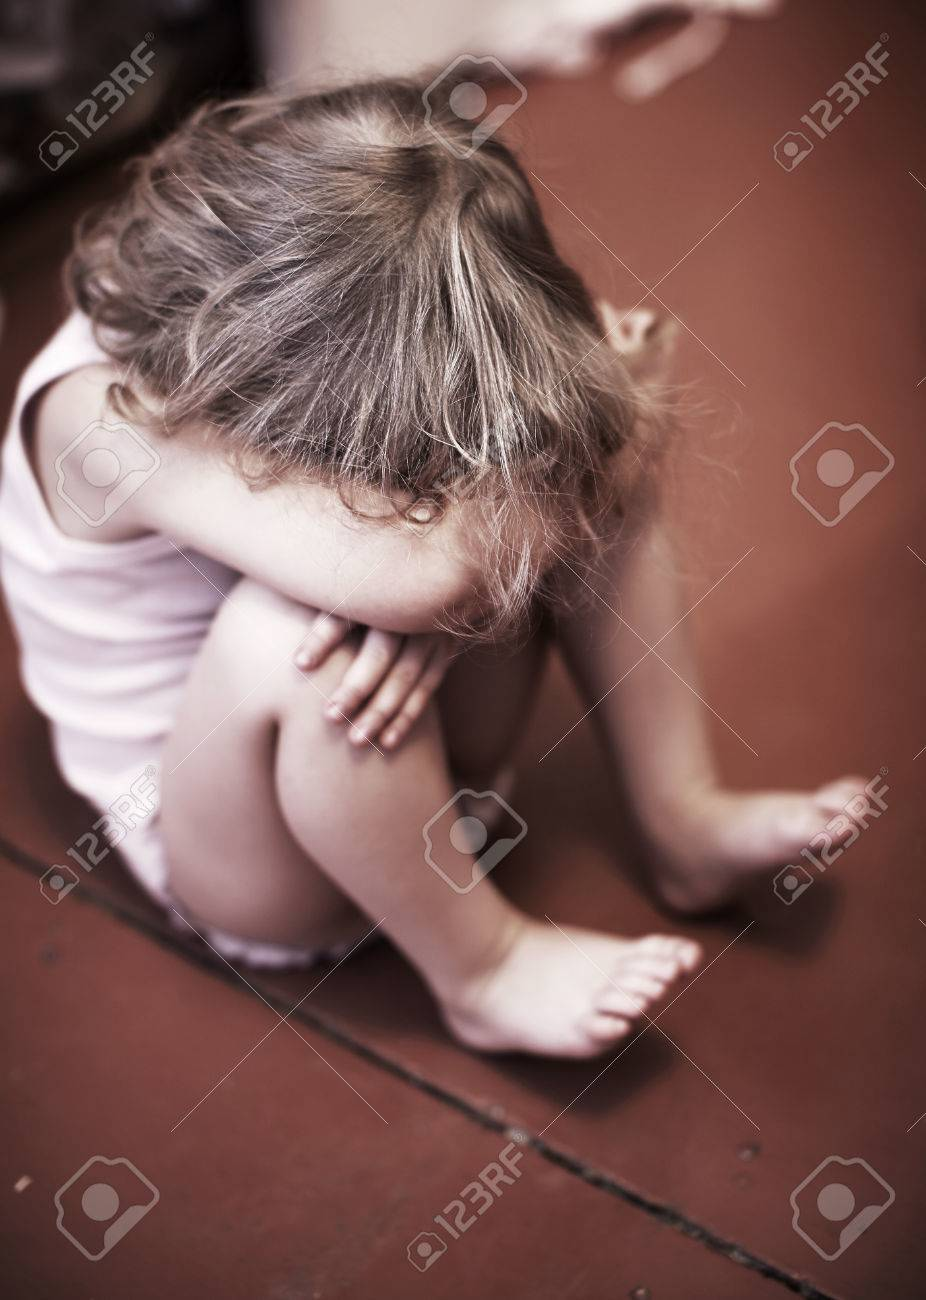 Sad Baby Girl Photo : photo, Baby., Crying, Little, Stock, Photo,, Picture, Royalty, Image., Image, 73753883.